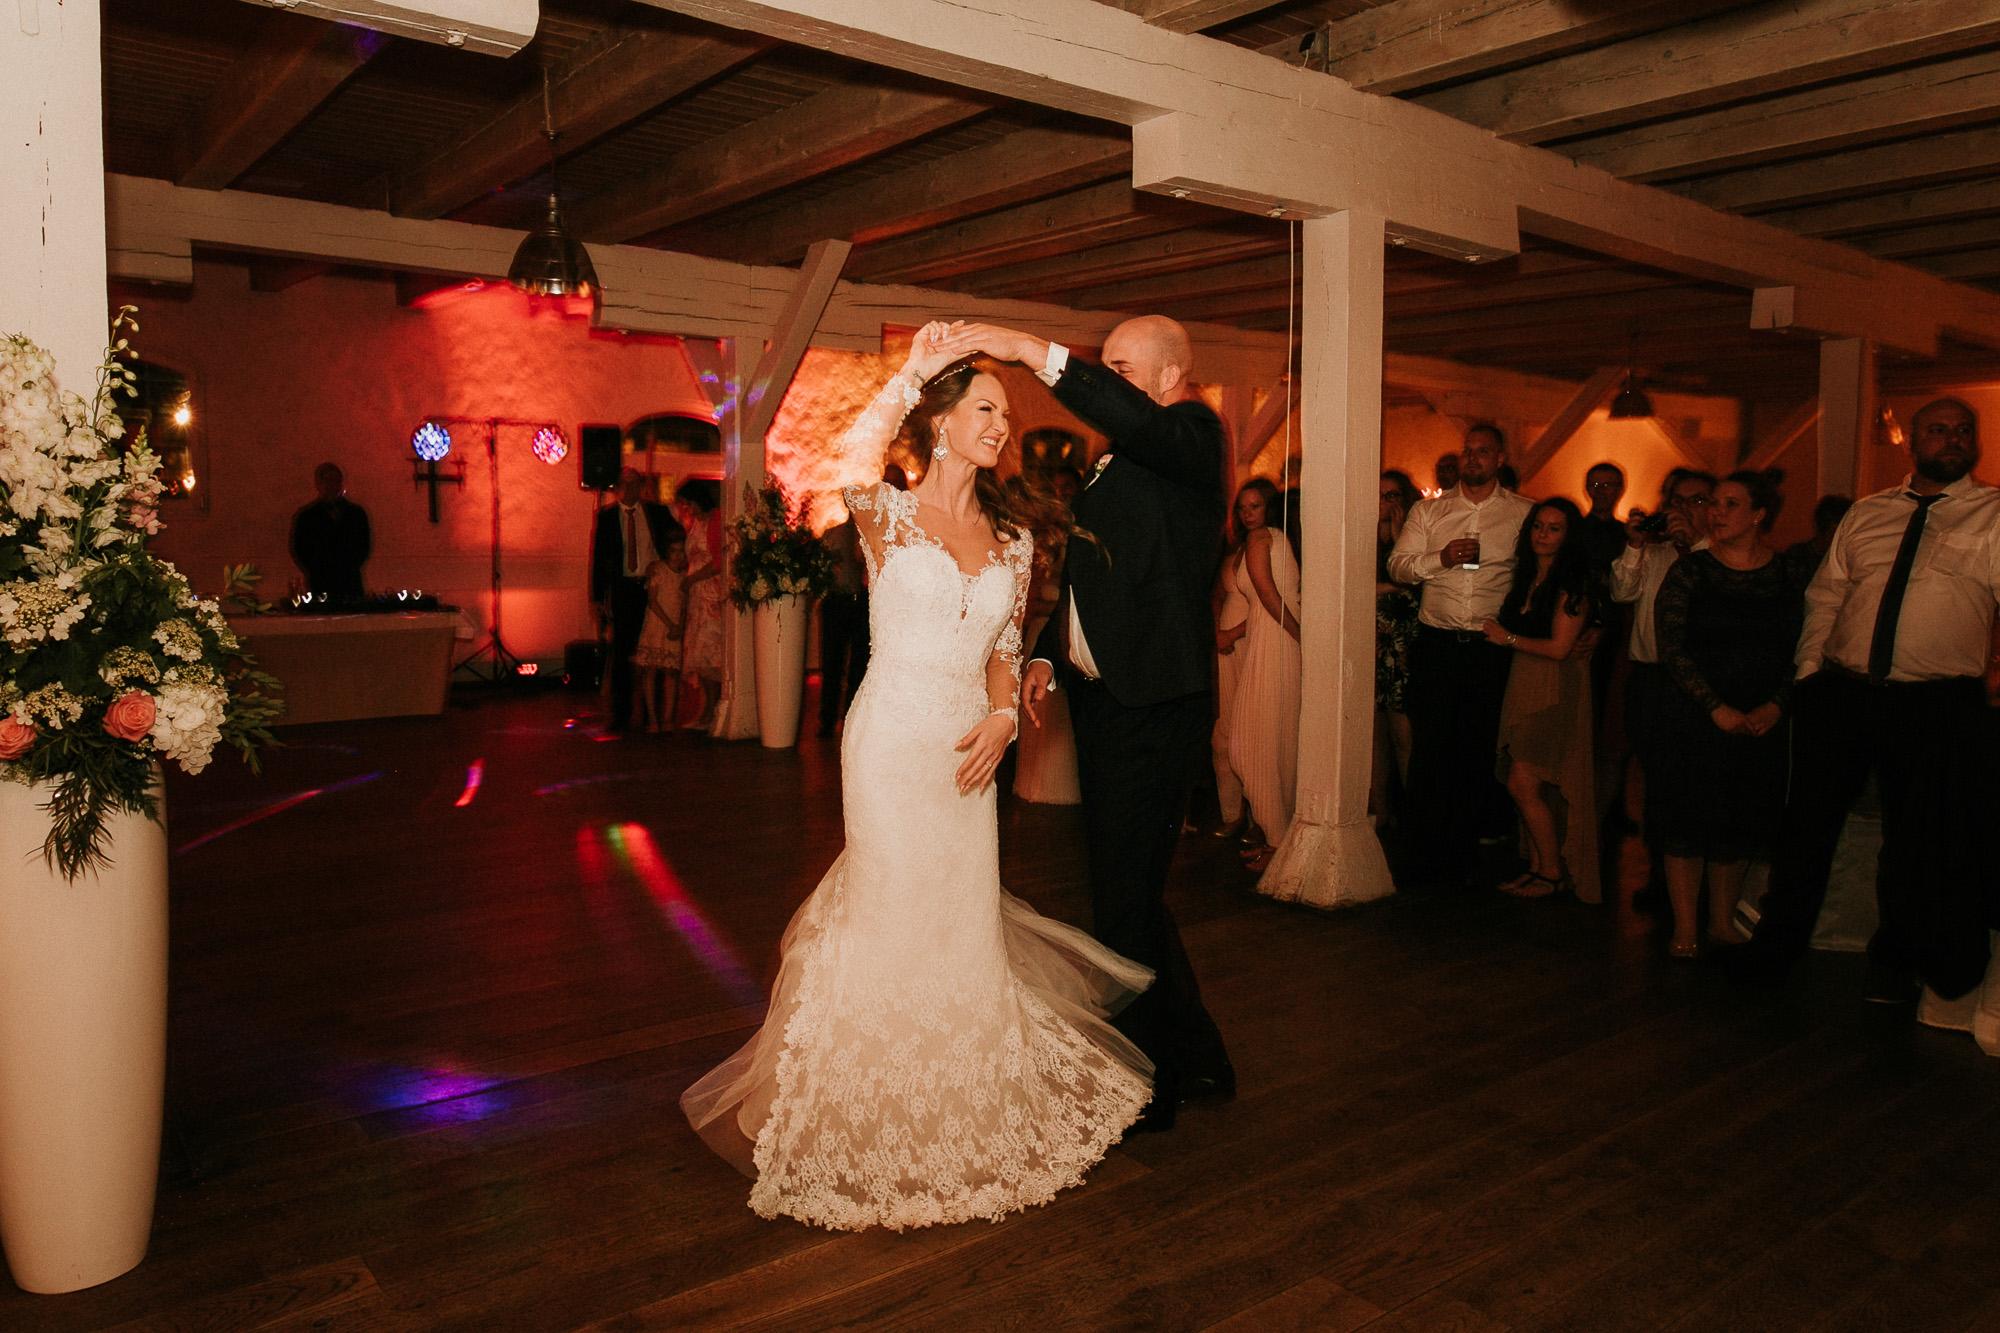 DanielaMarquardtPhotography_Hochzeitsfotograf_Düsseldorf_Köln_Mallorca_Bayern_Austria_Harz_Wedding_AileenundLennart_Weddingphotographer_Ibiza_Tuskany_Italien_Toskana_Portugal_Lissabon272